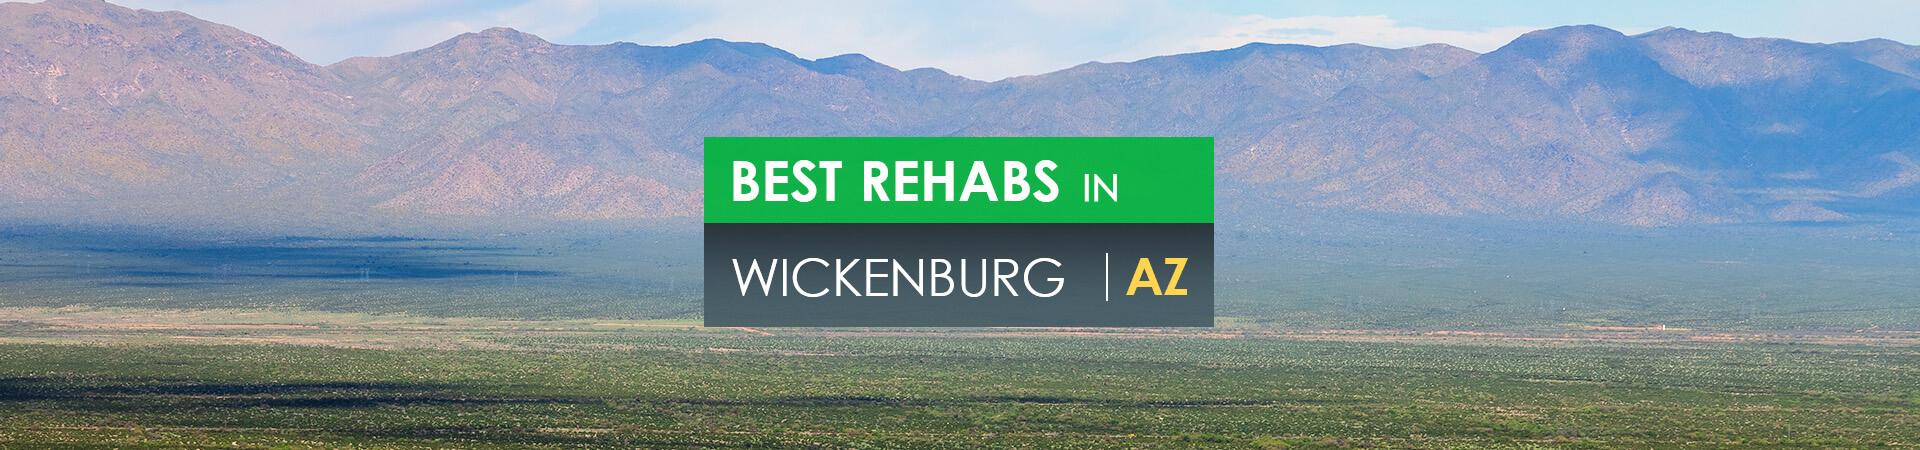 Best rehabs in Wickenburg, AZ